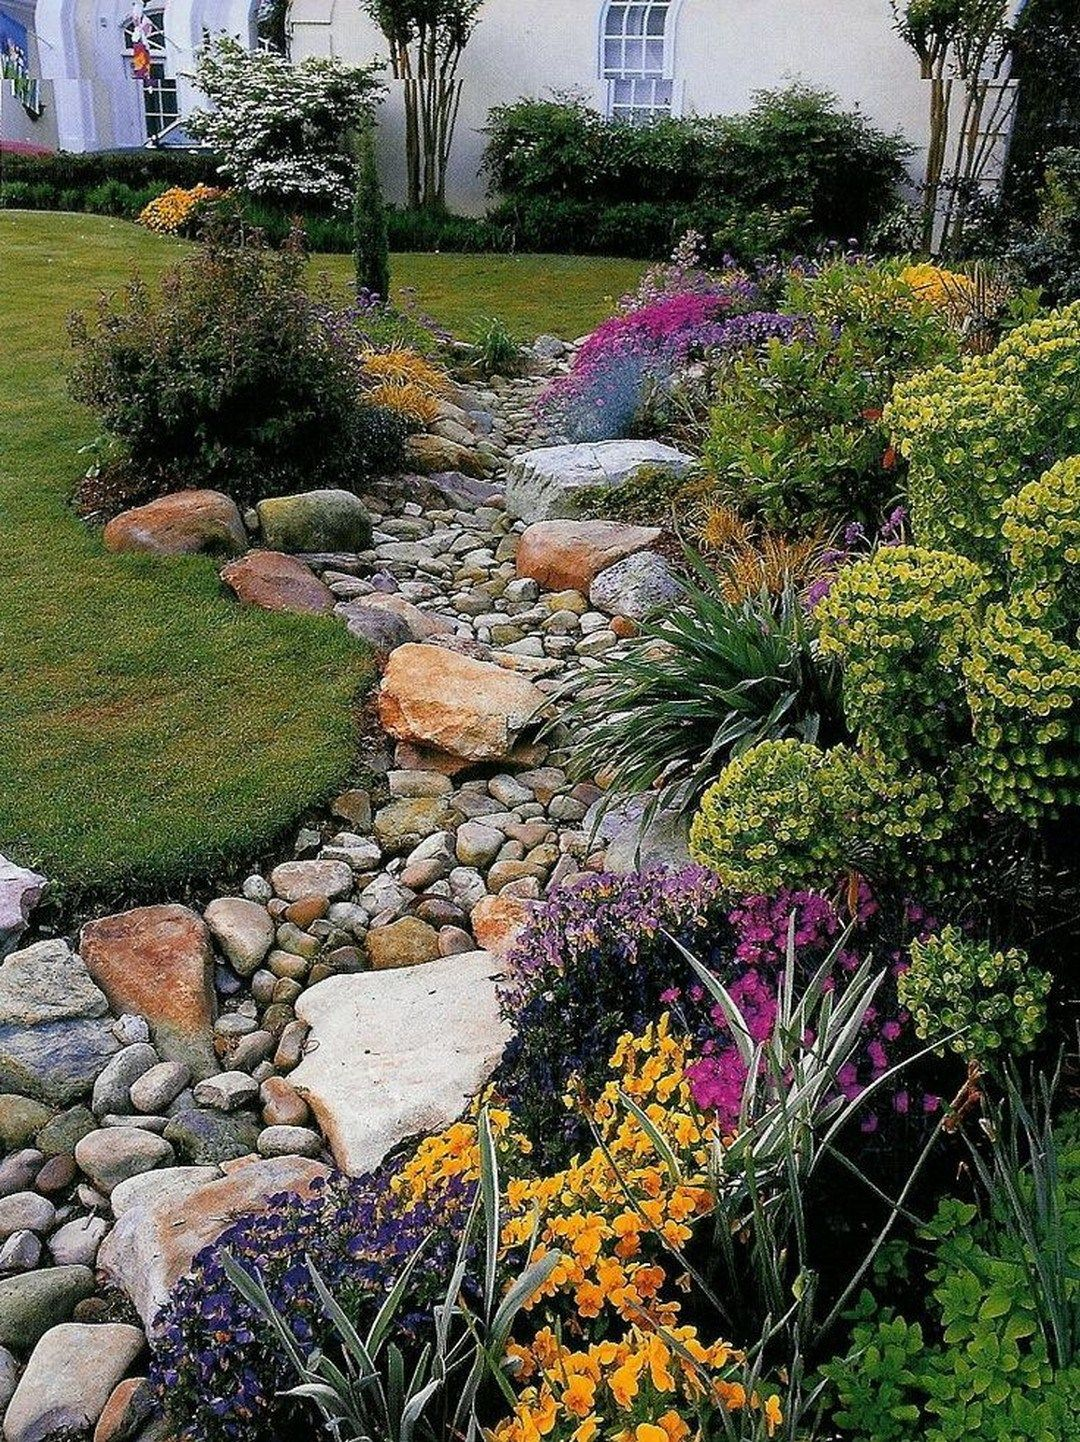 80 DIY Beautiful Front Yard Landscaping Ideas 75 Yard